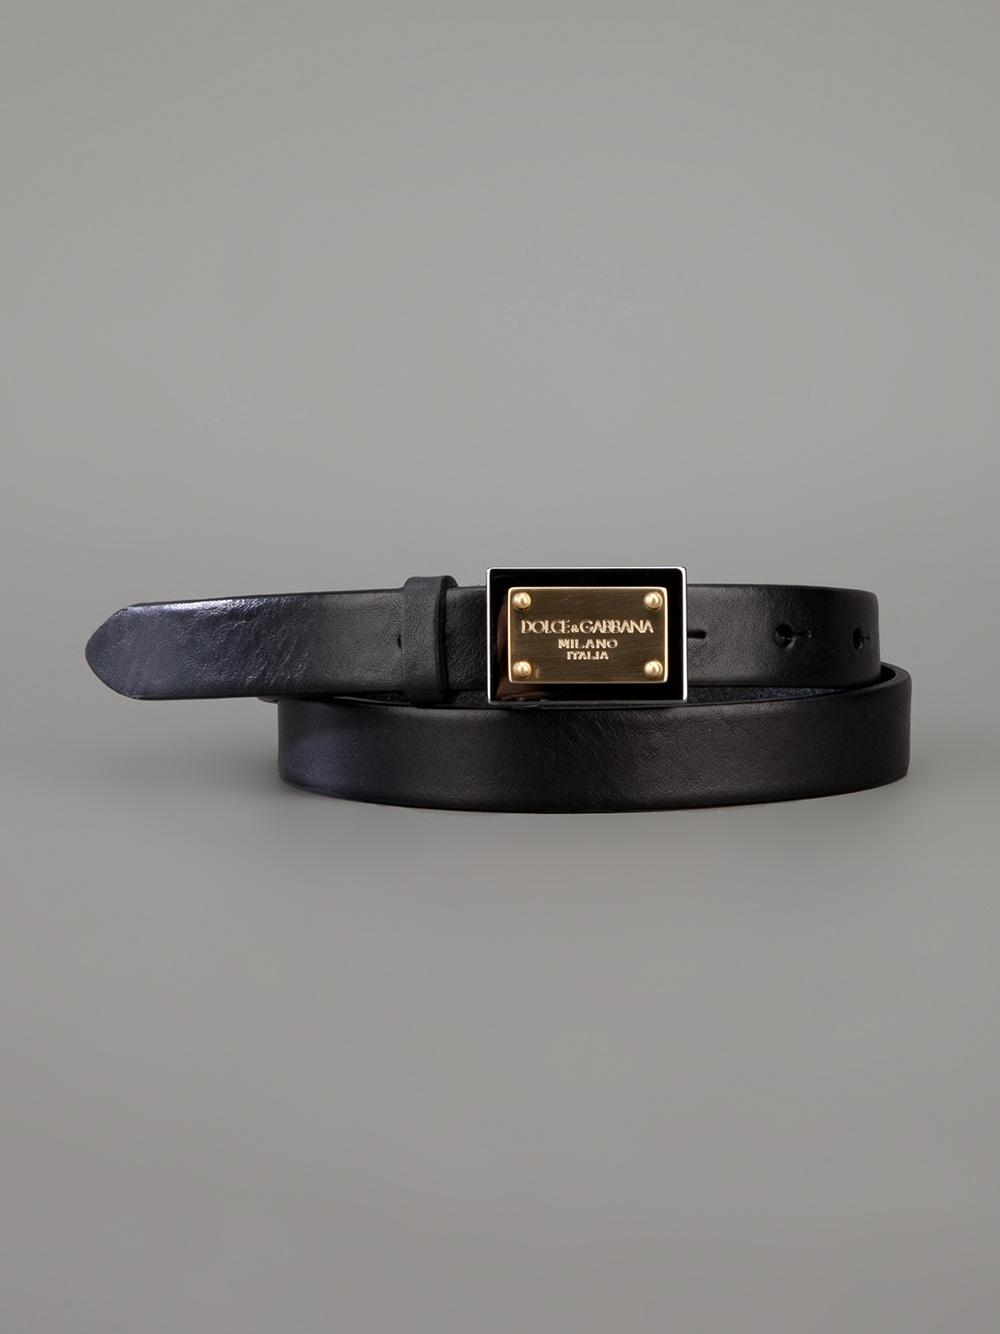 52b97b08a3 ... get lyst dolce gabbana plaque buckle belt in black 951b4 c5939